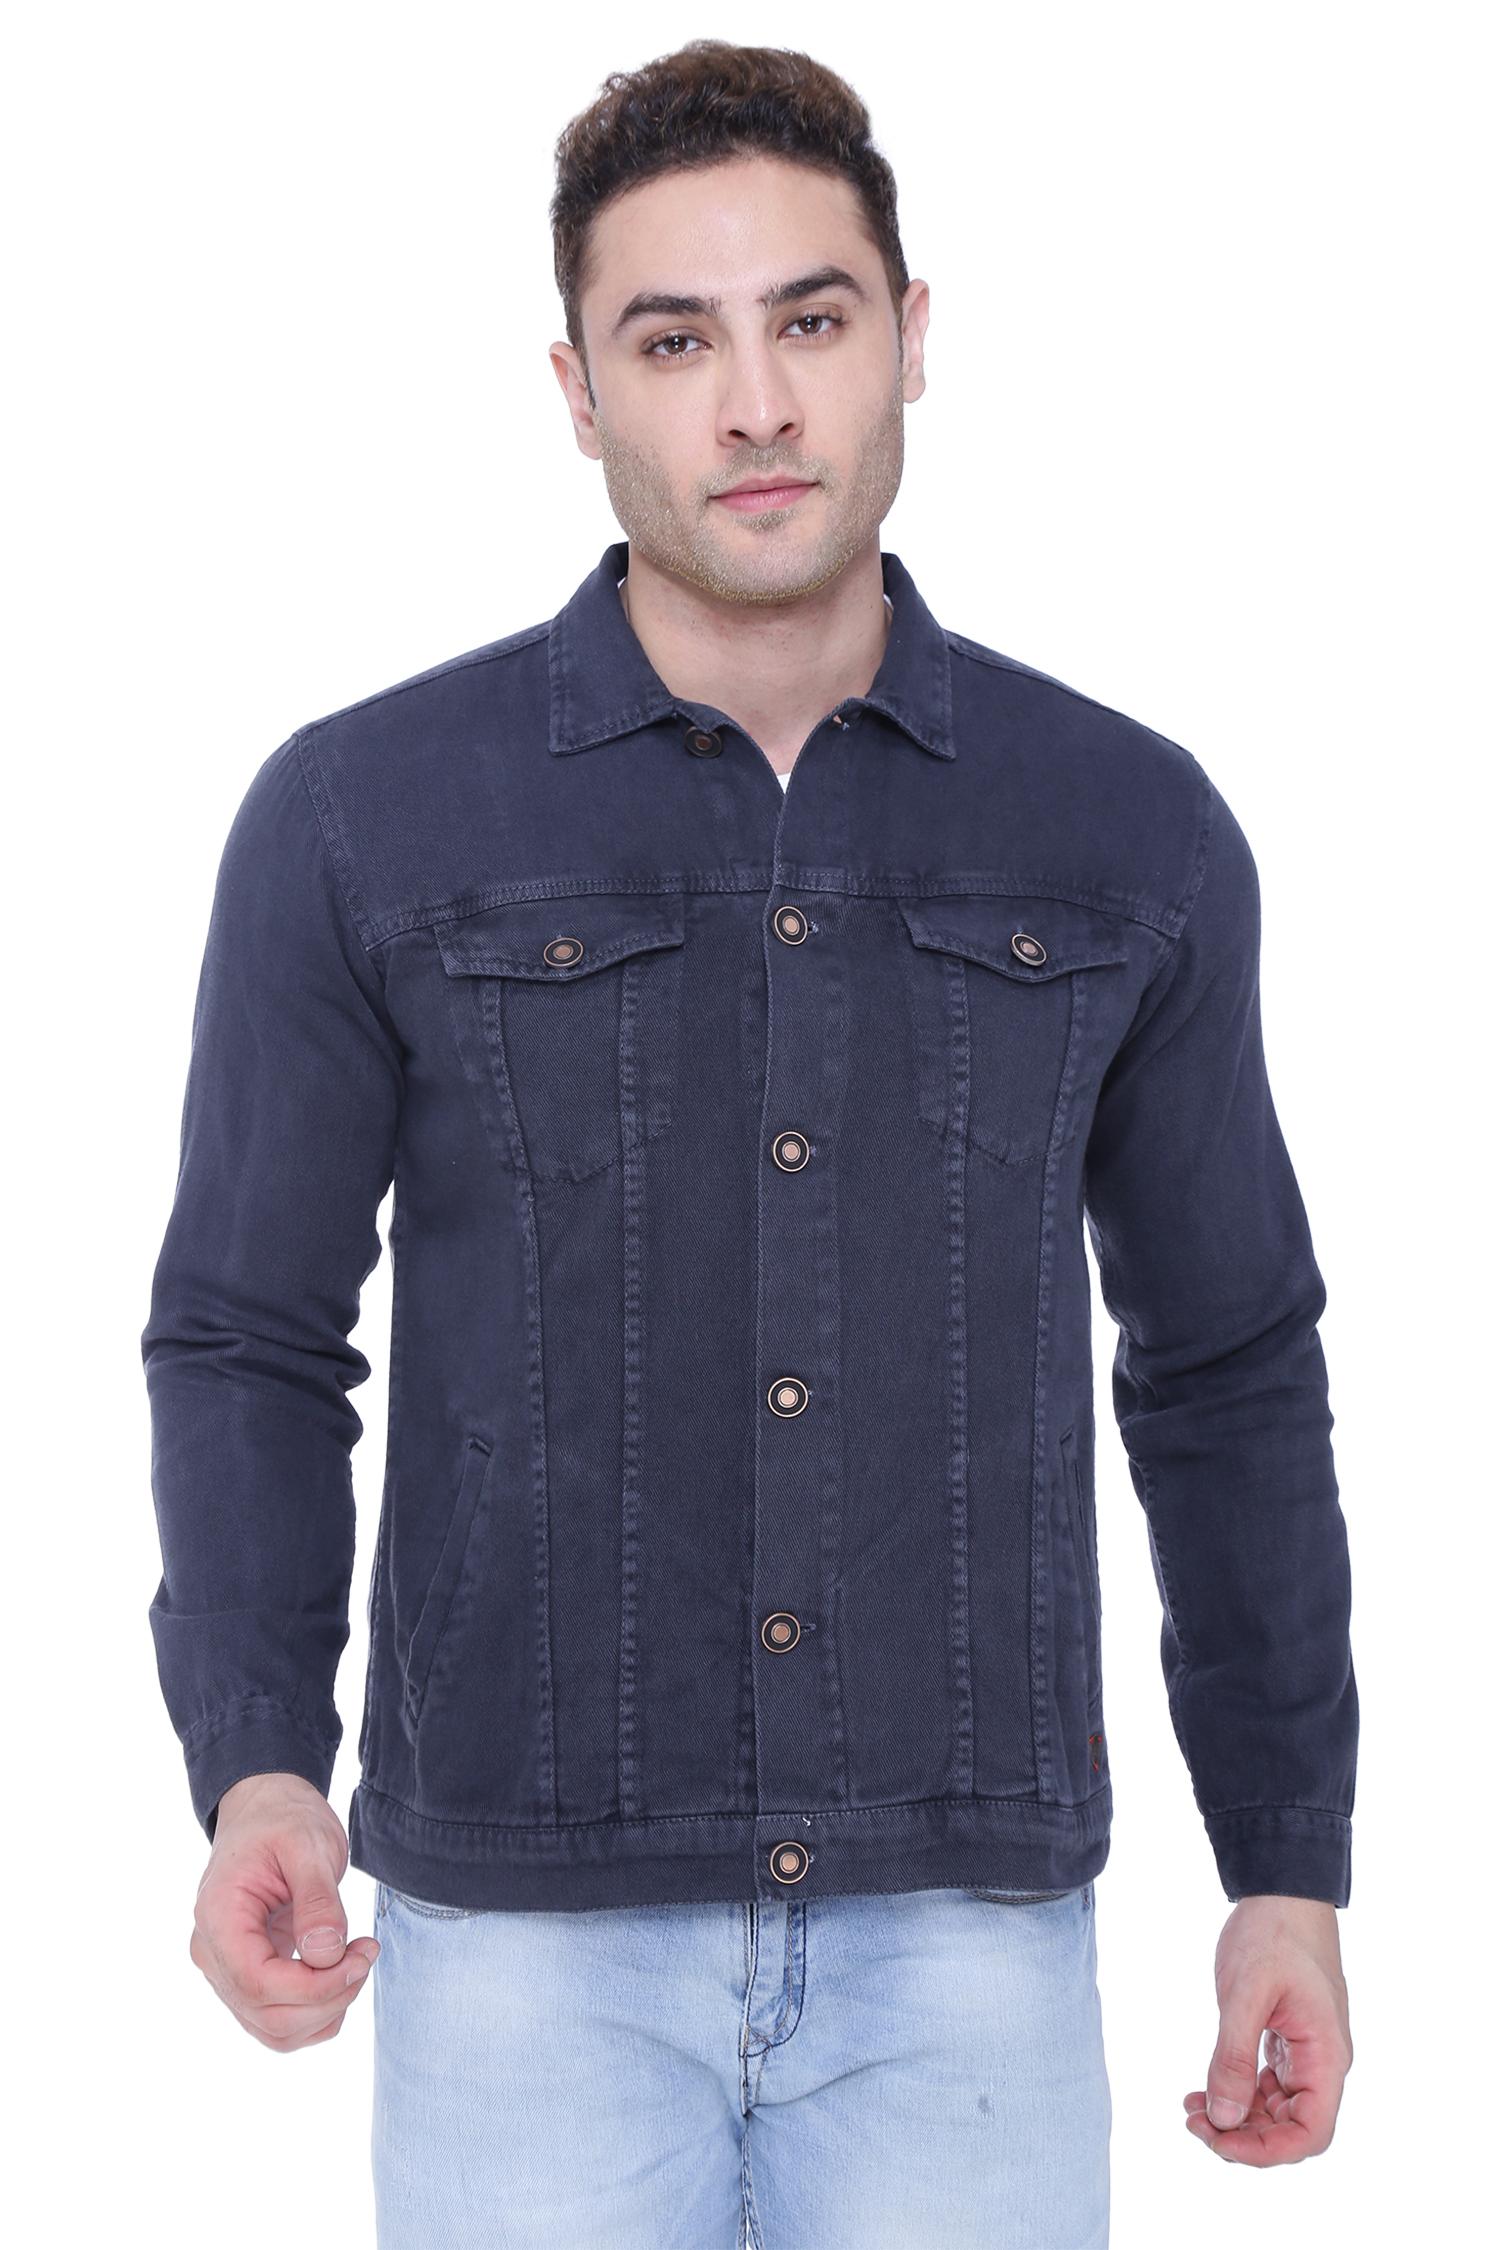 Kuons Avenue | Kuons Avenue Men's Dark Grey Denim Jacket- KACLFS1362GY